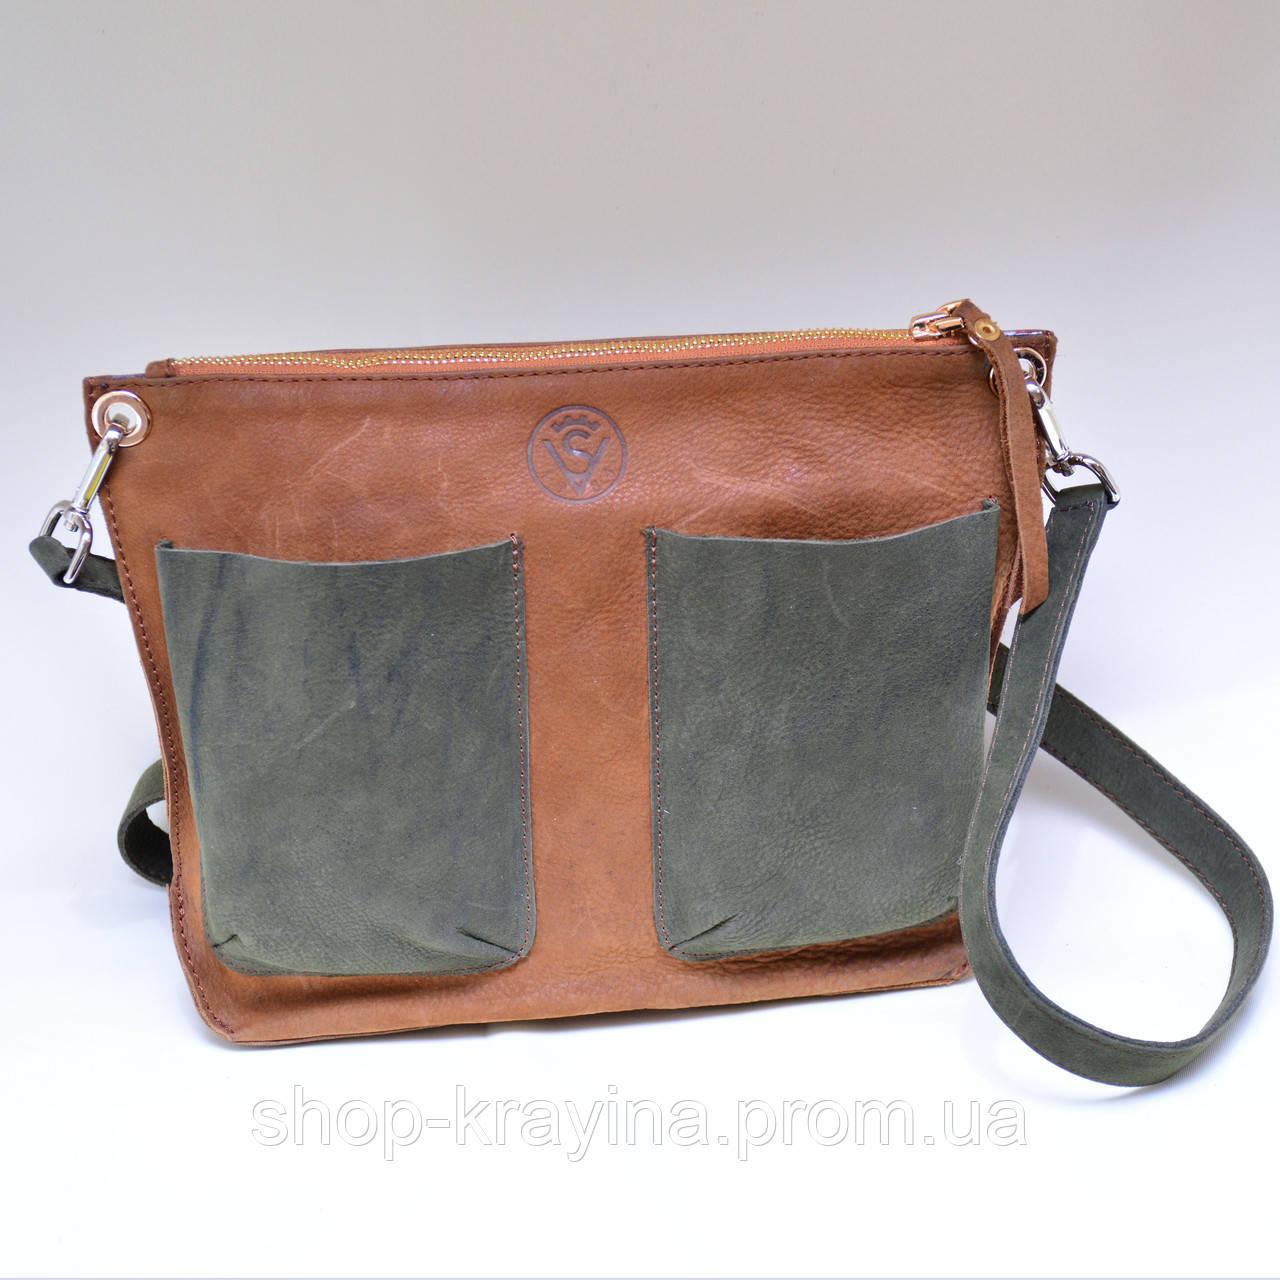 Кожаная сумка VS102 brown green 30х23х5 см